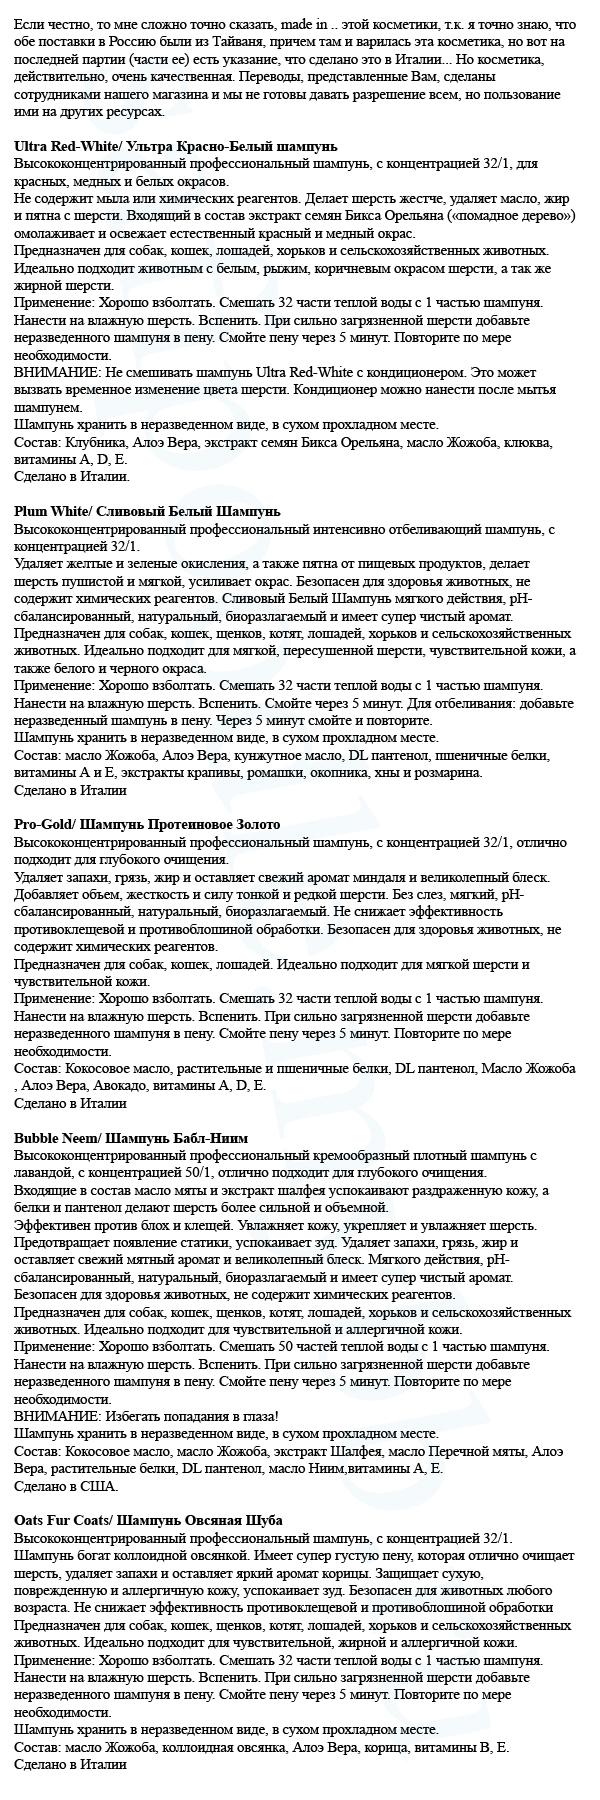 http://s8.uploads.ru/7JfMg.jpg